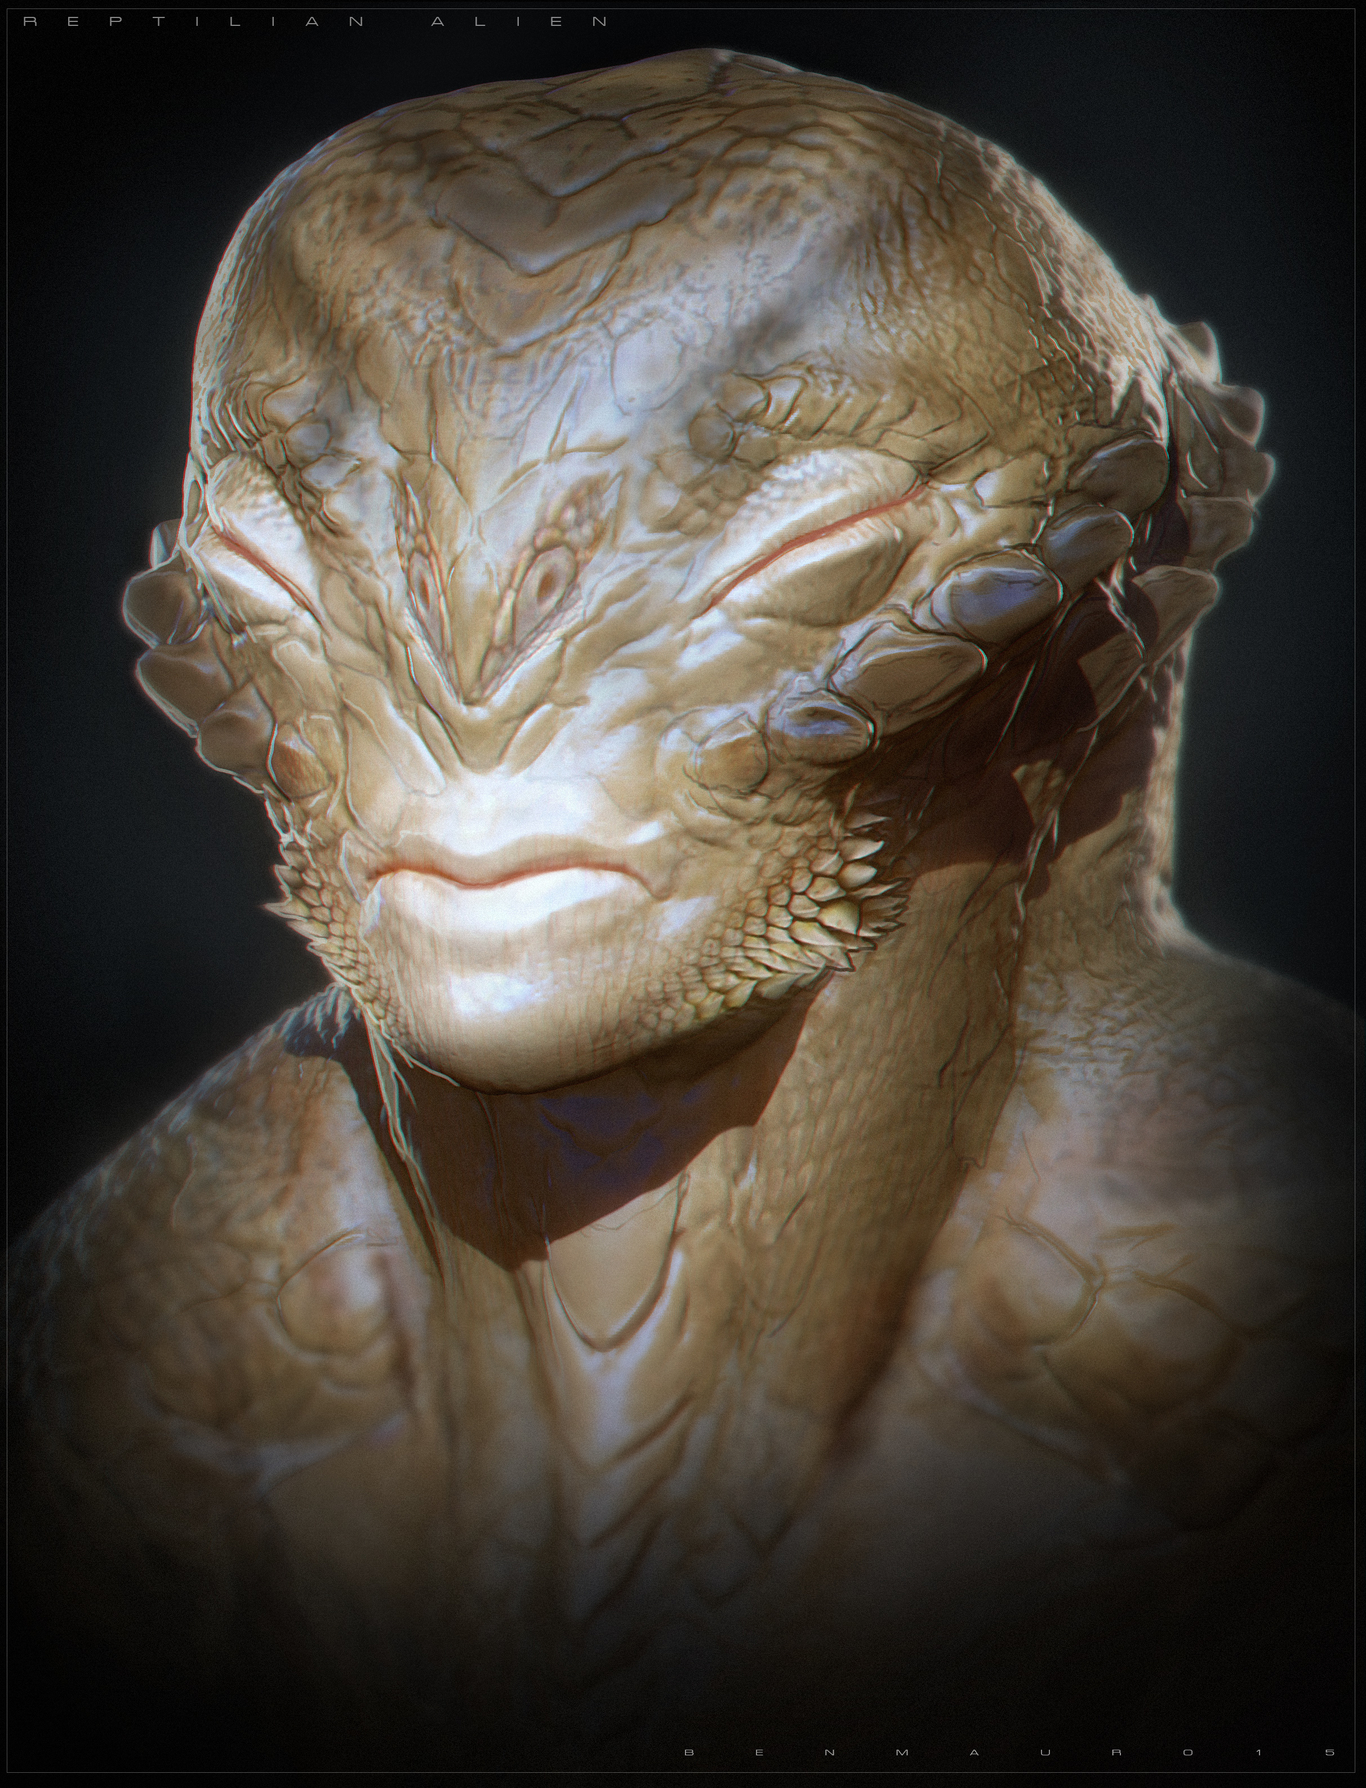 Benmauro desert alien 1 4aaea78f dvn8